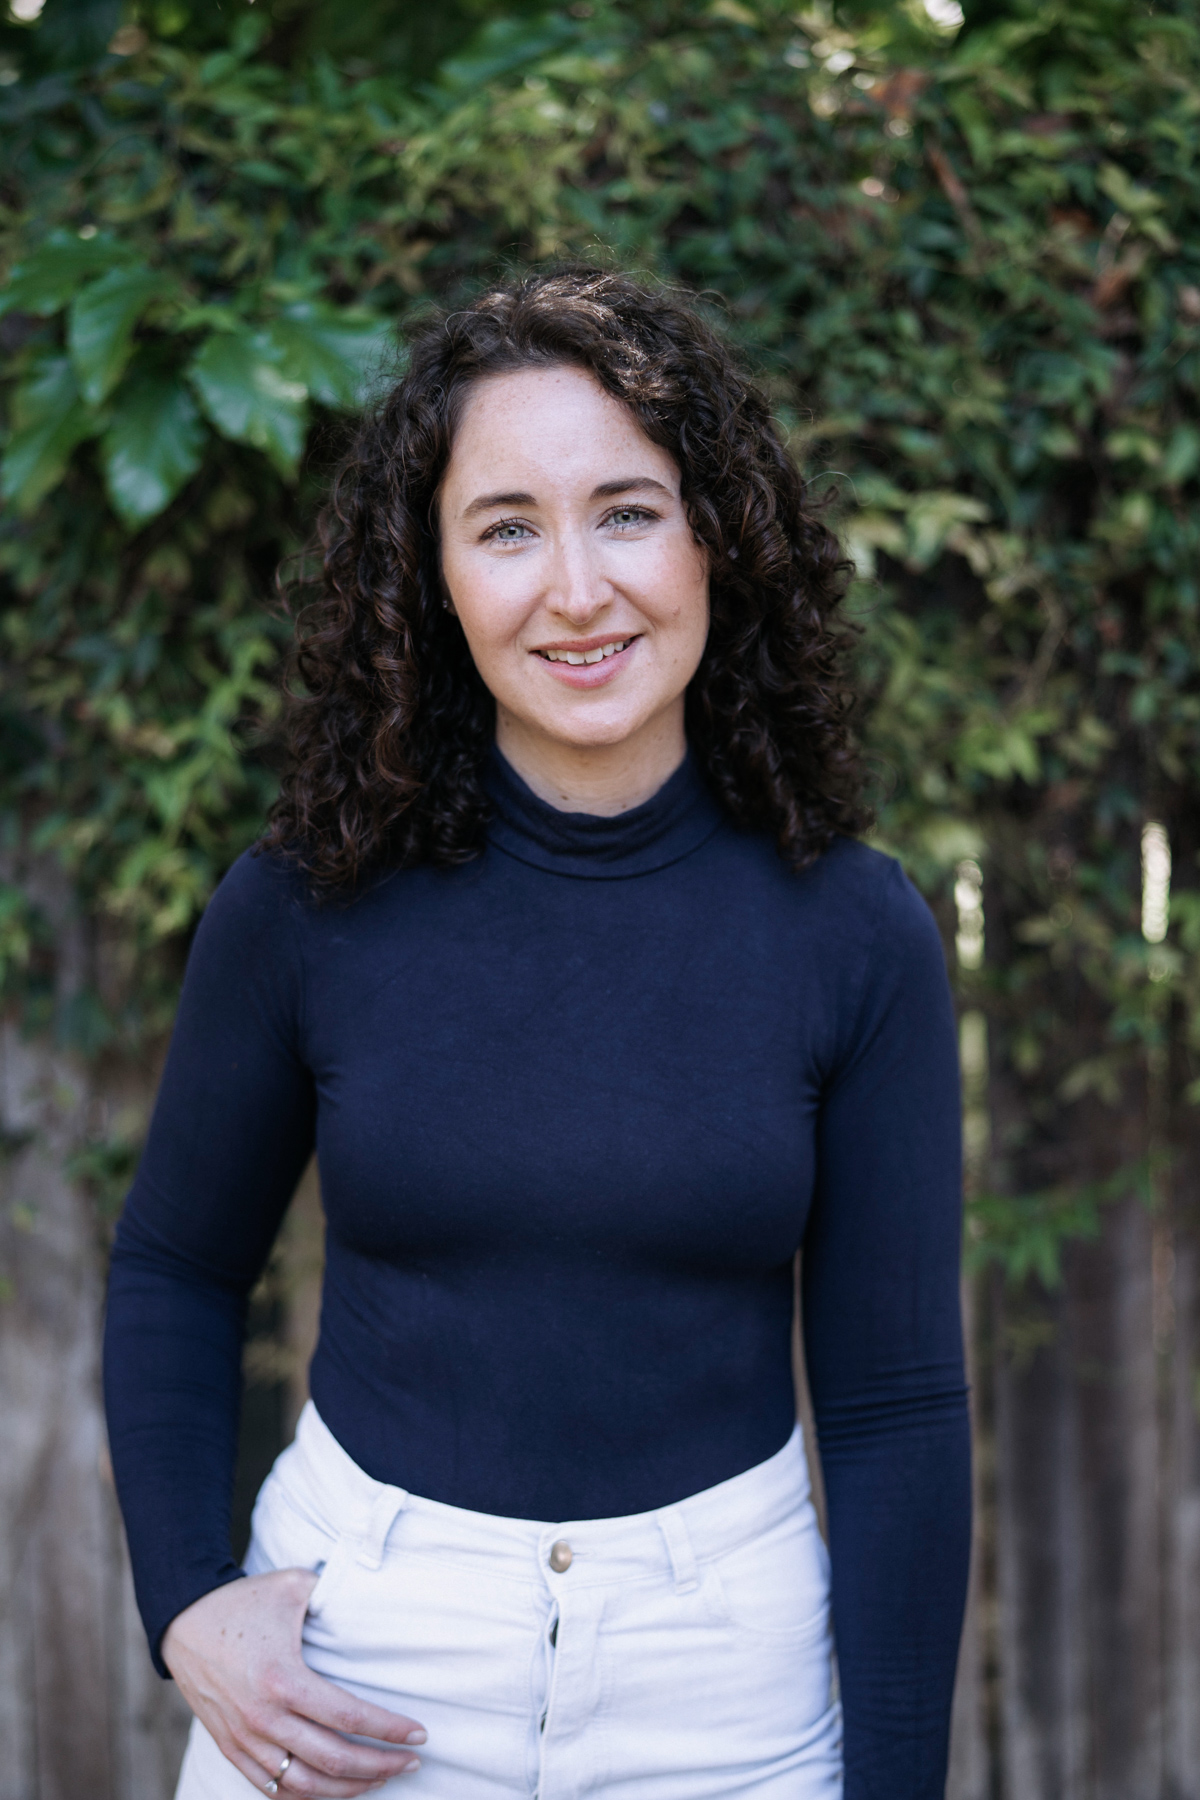 Humble Rowan Turtleneck | Megan Nielsen Blog